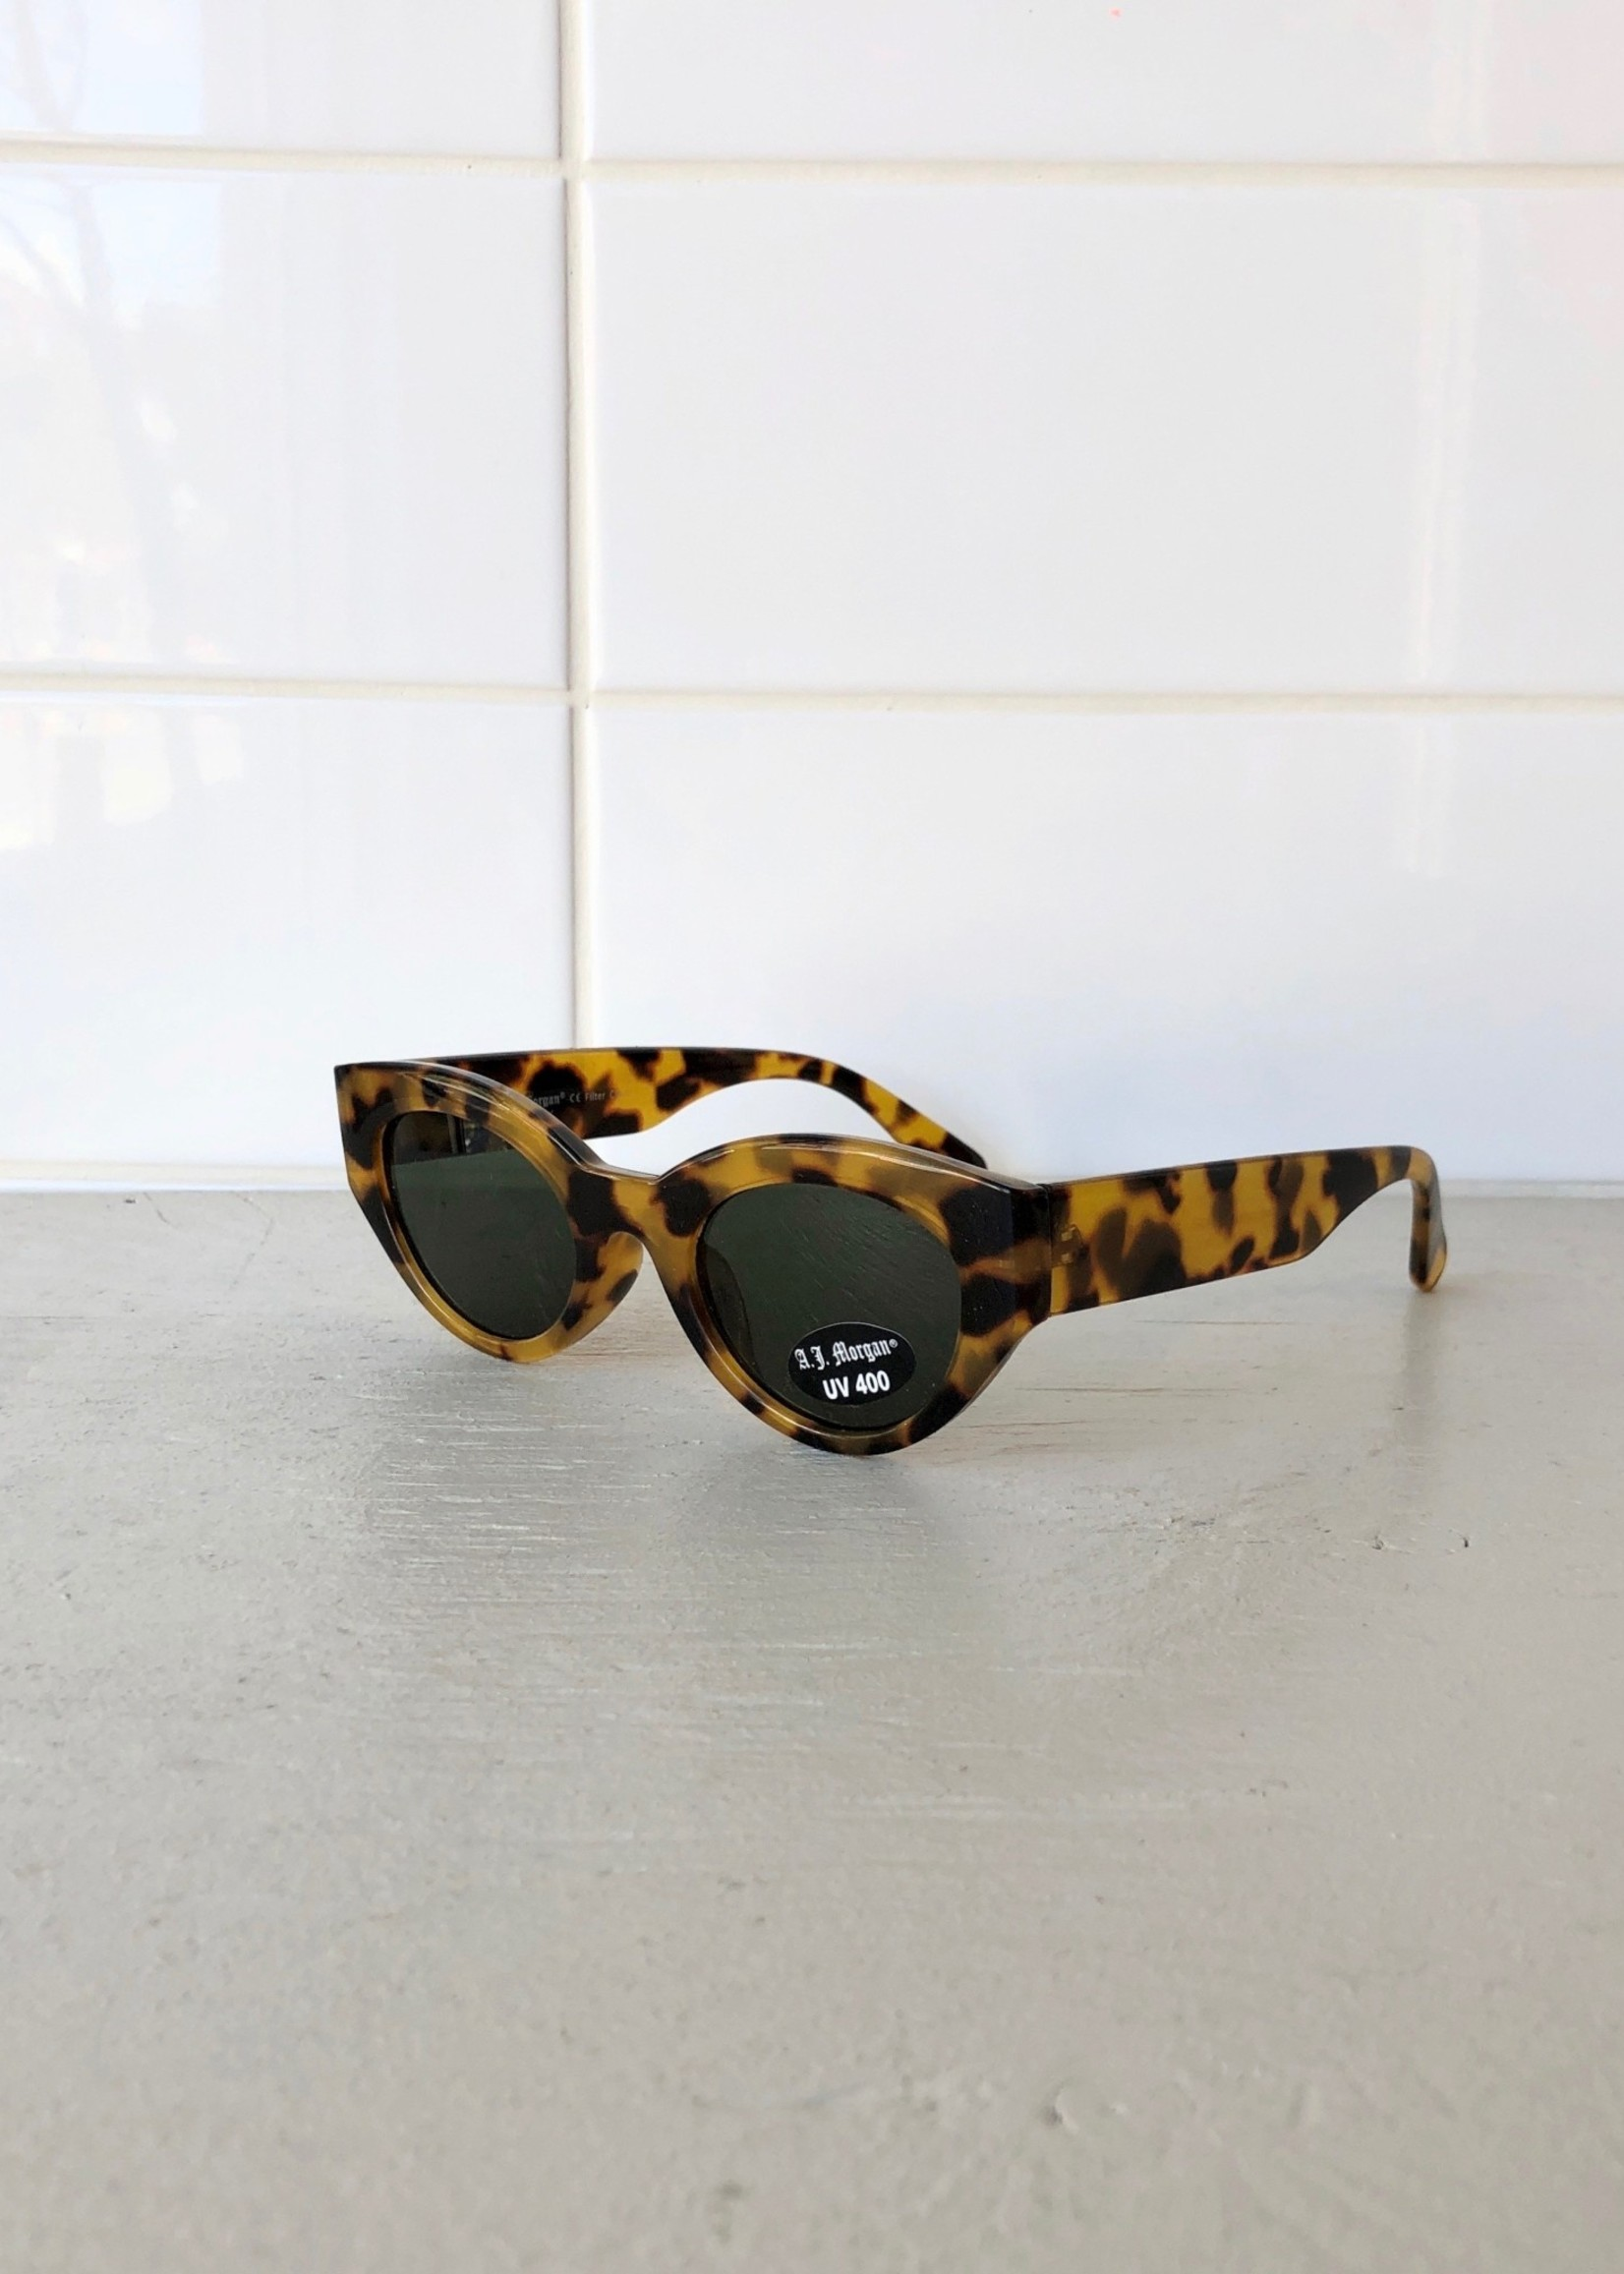 A. J. Morgan Damn Gina Sunglasses by A.J. Morgan